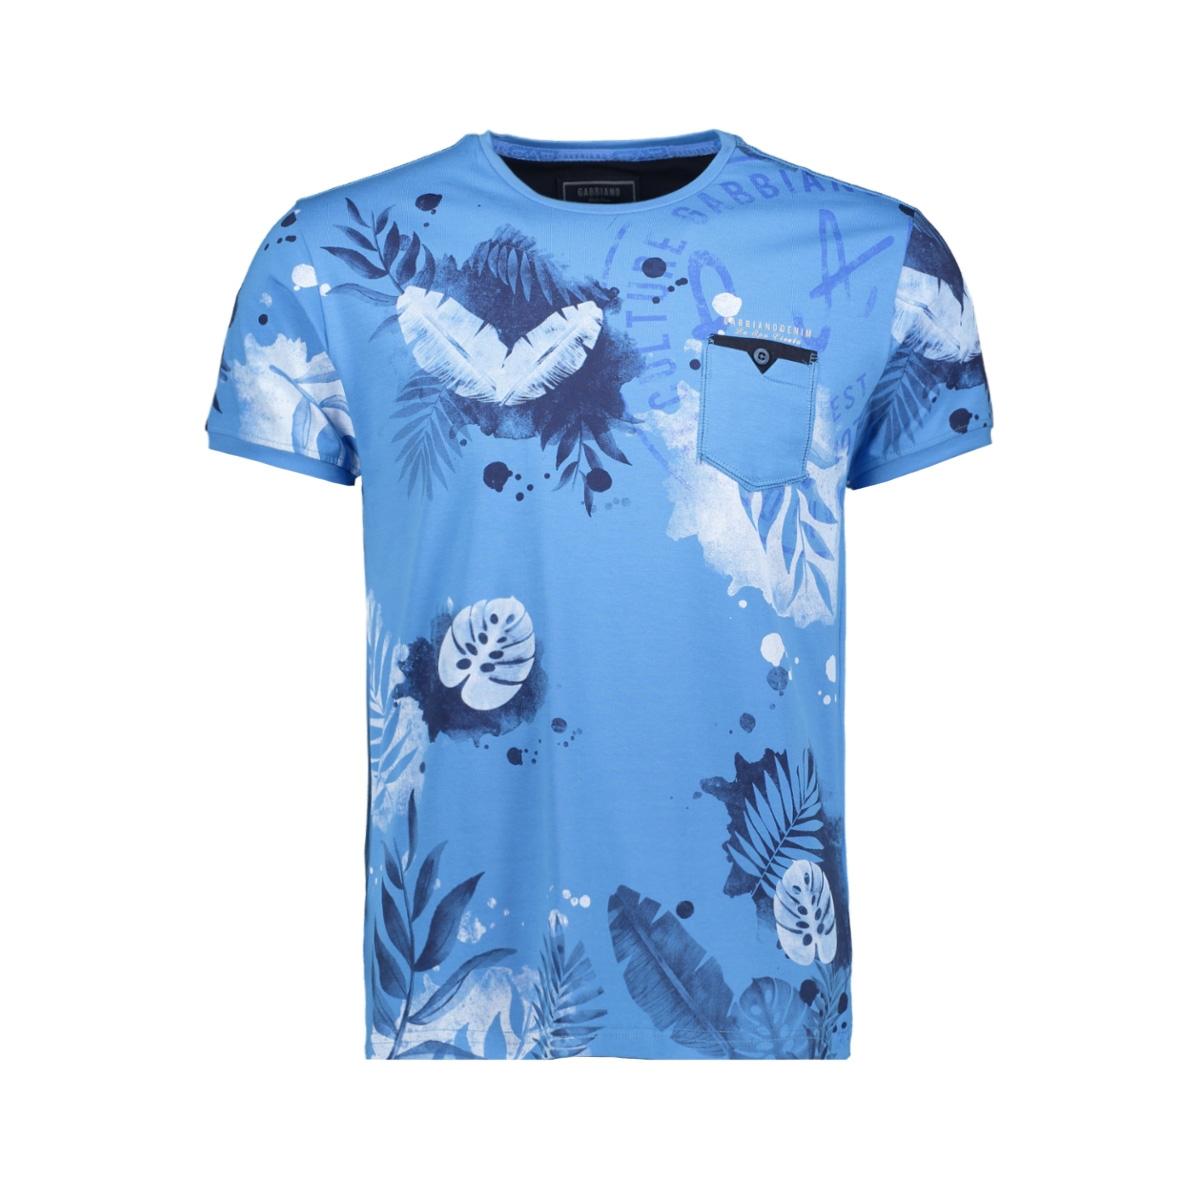 t shirt 15139 gabbiano t-shirt blue